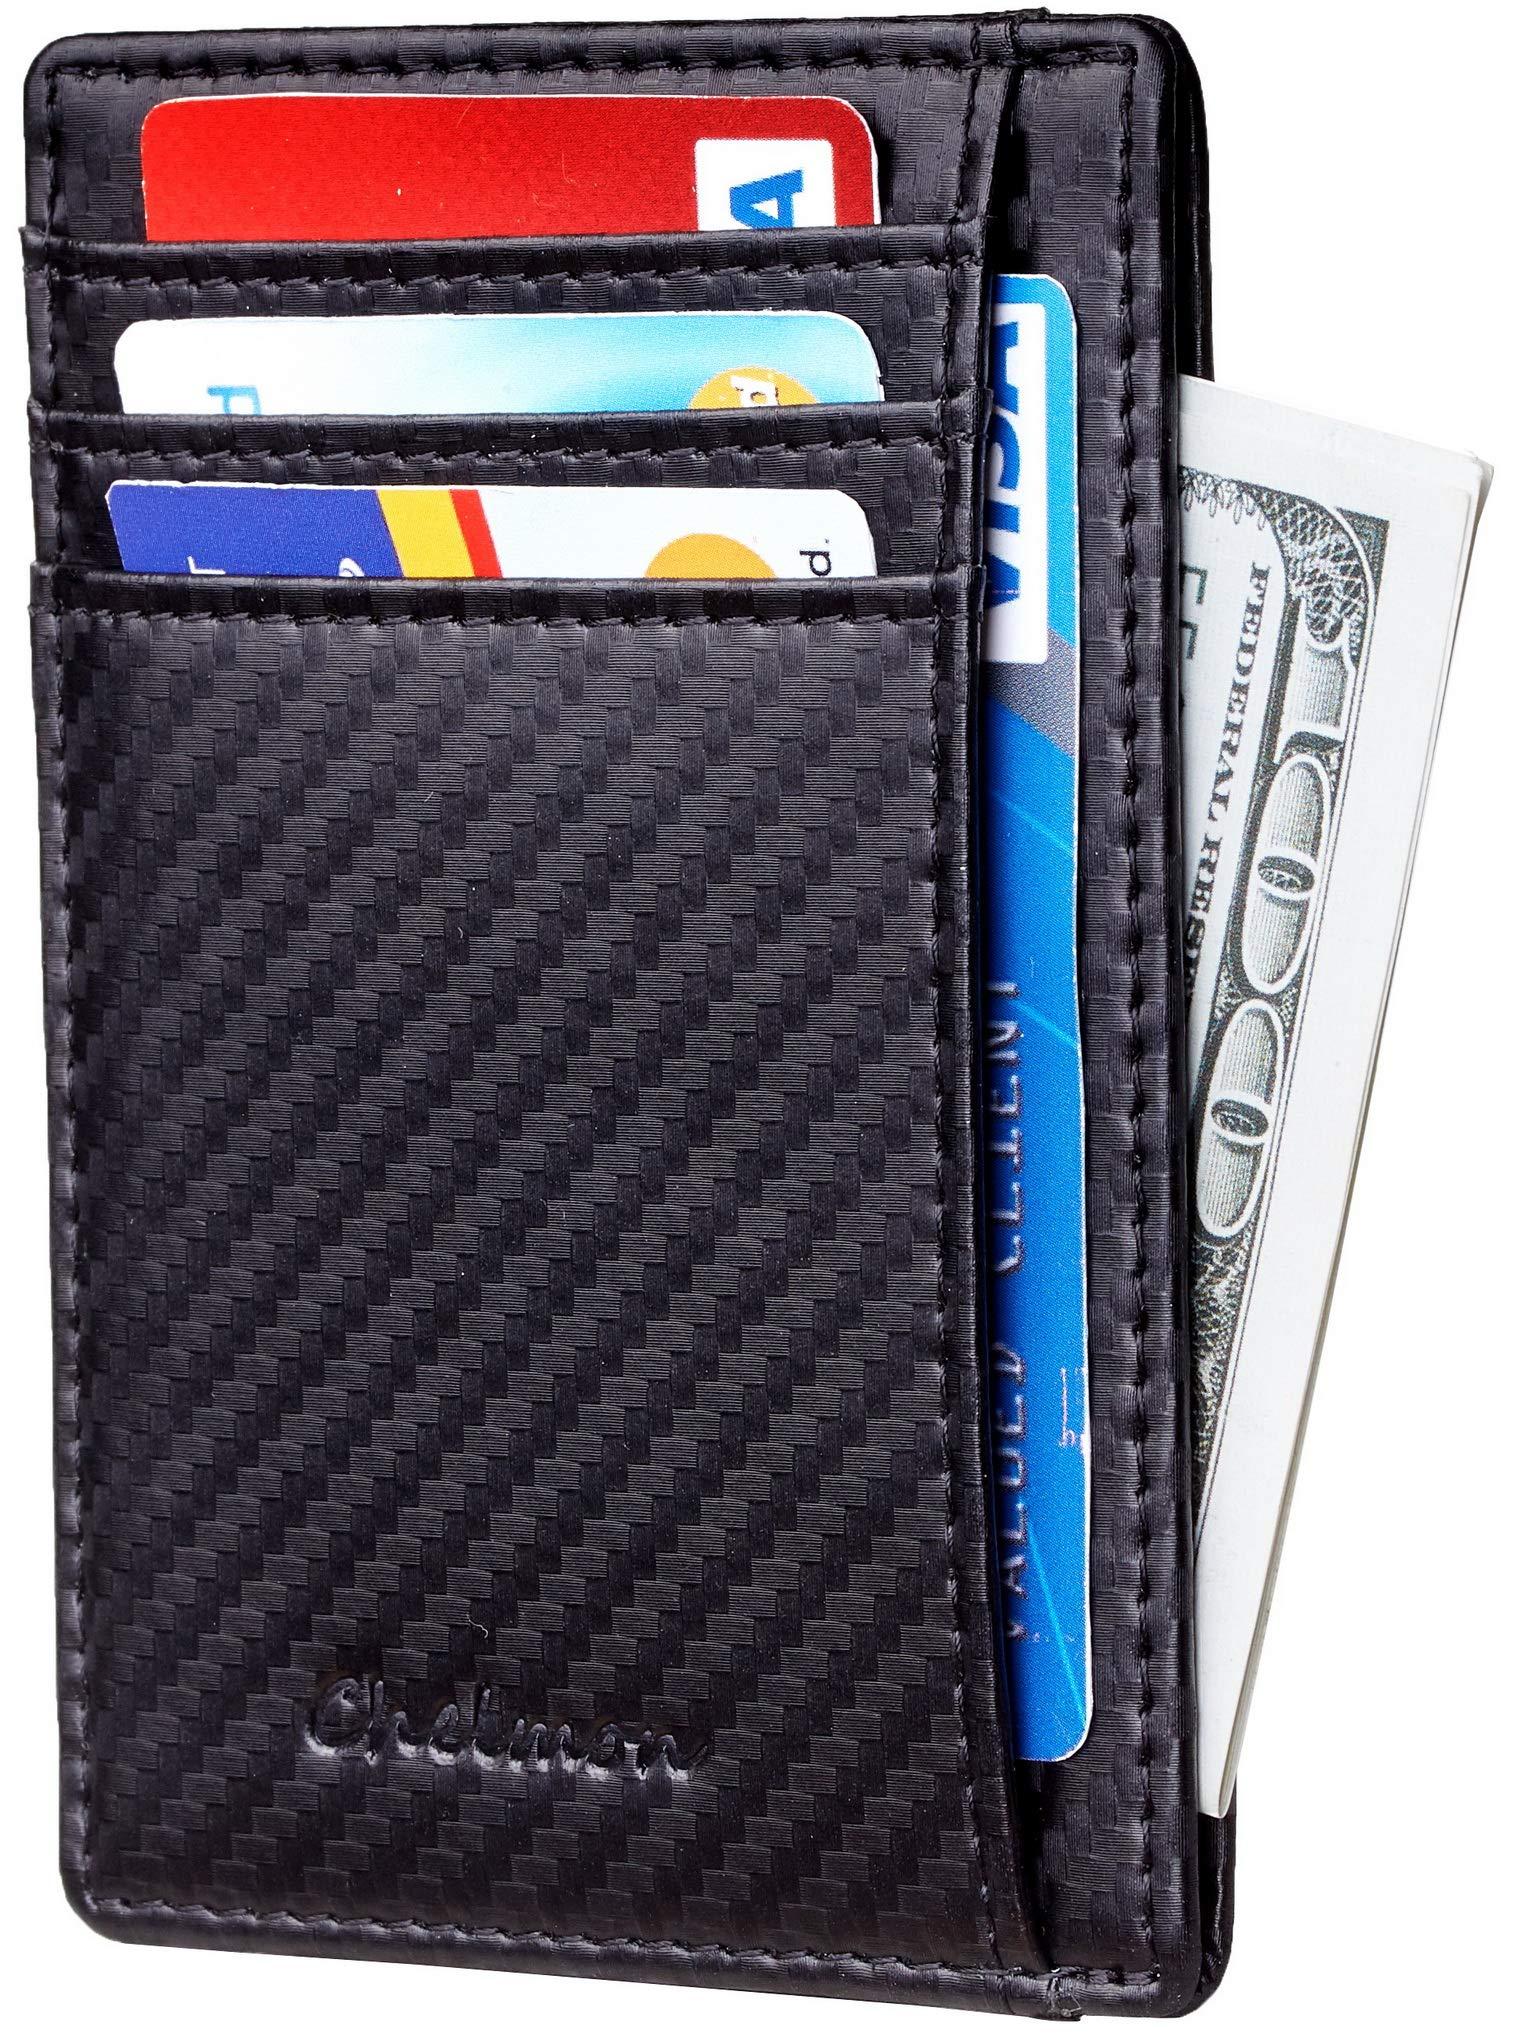 SimpacX Wallet Pocket Minimalist Secure